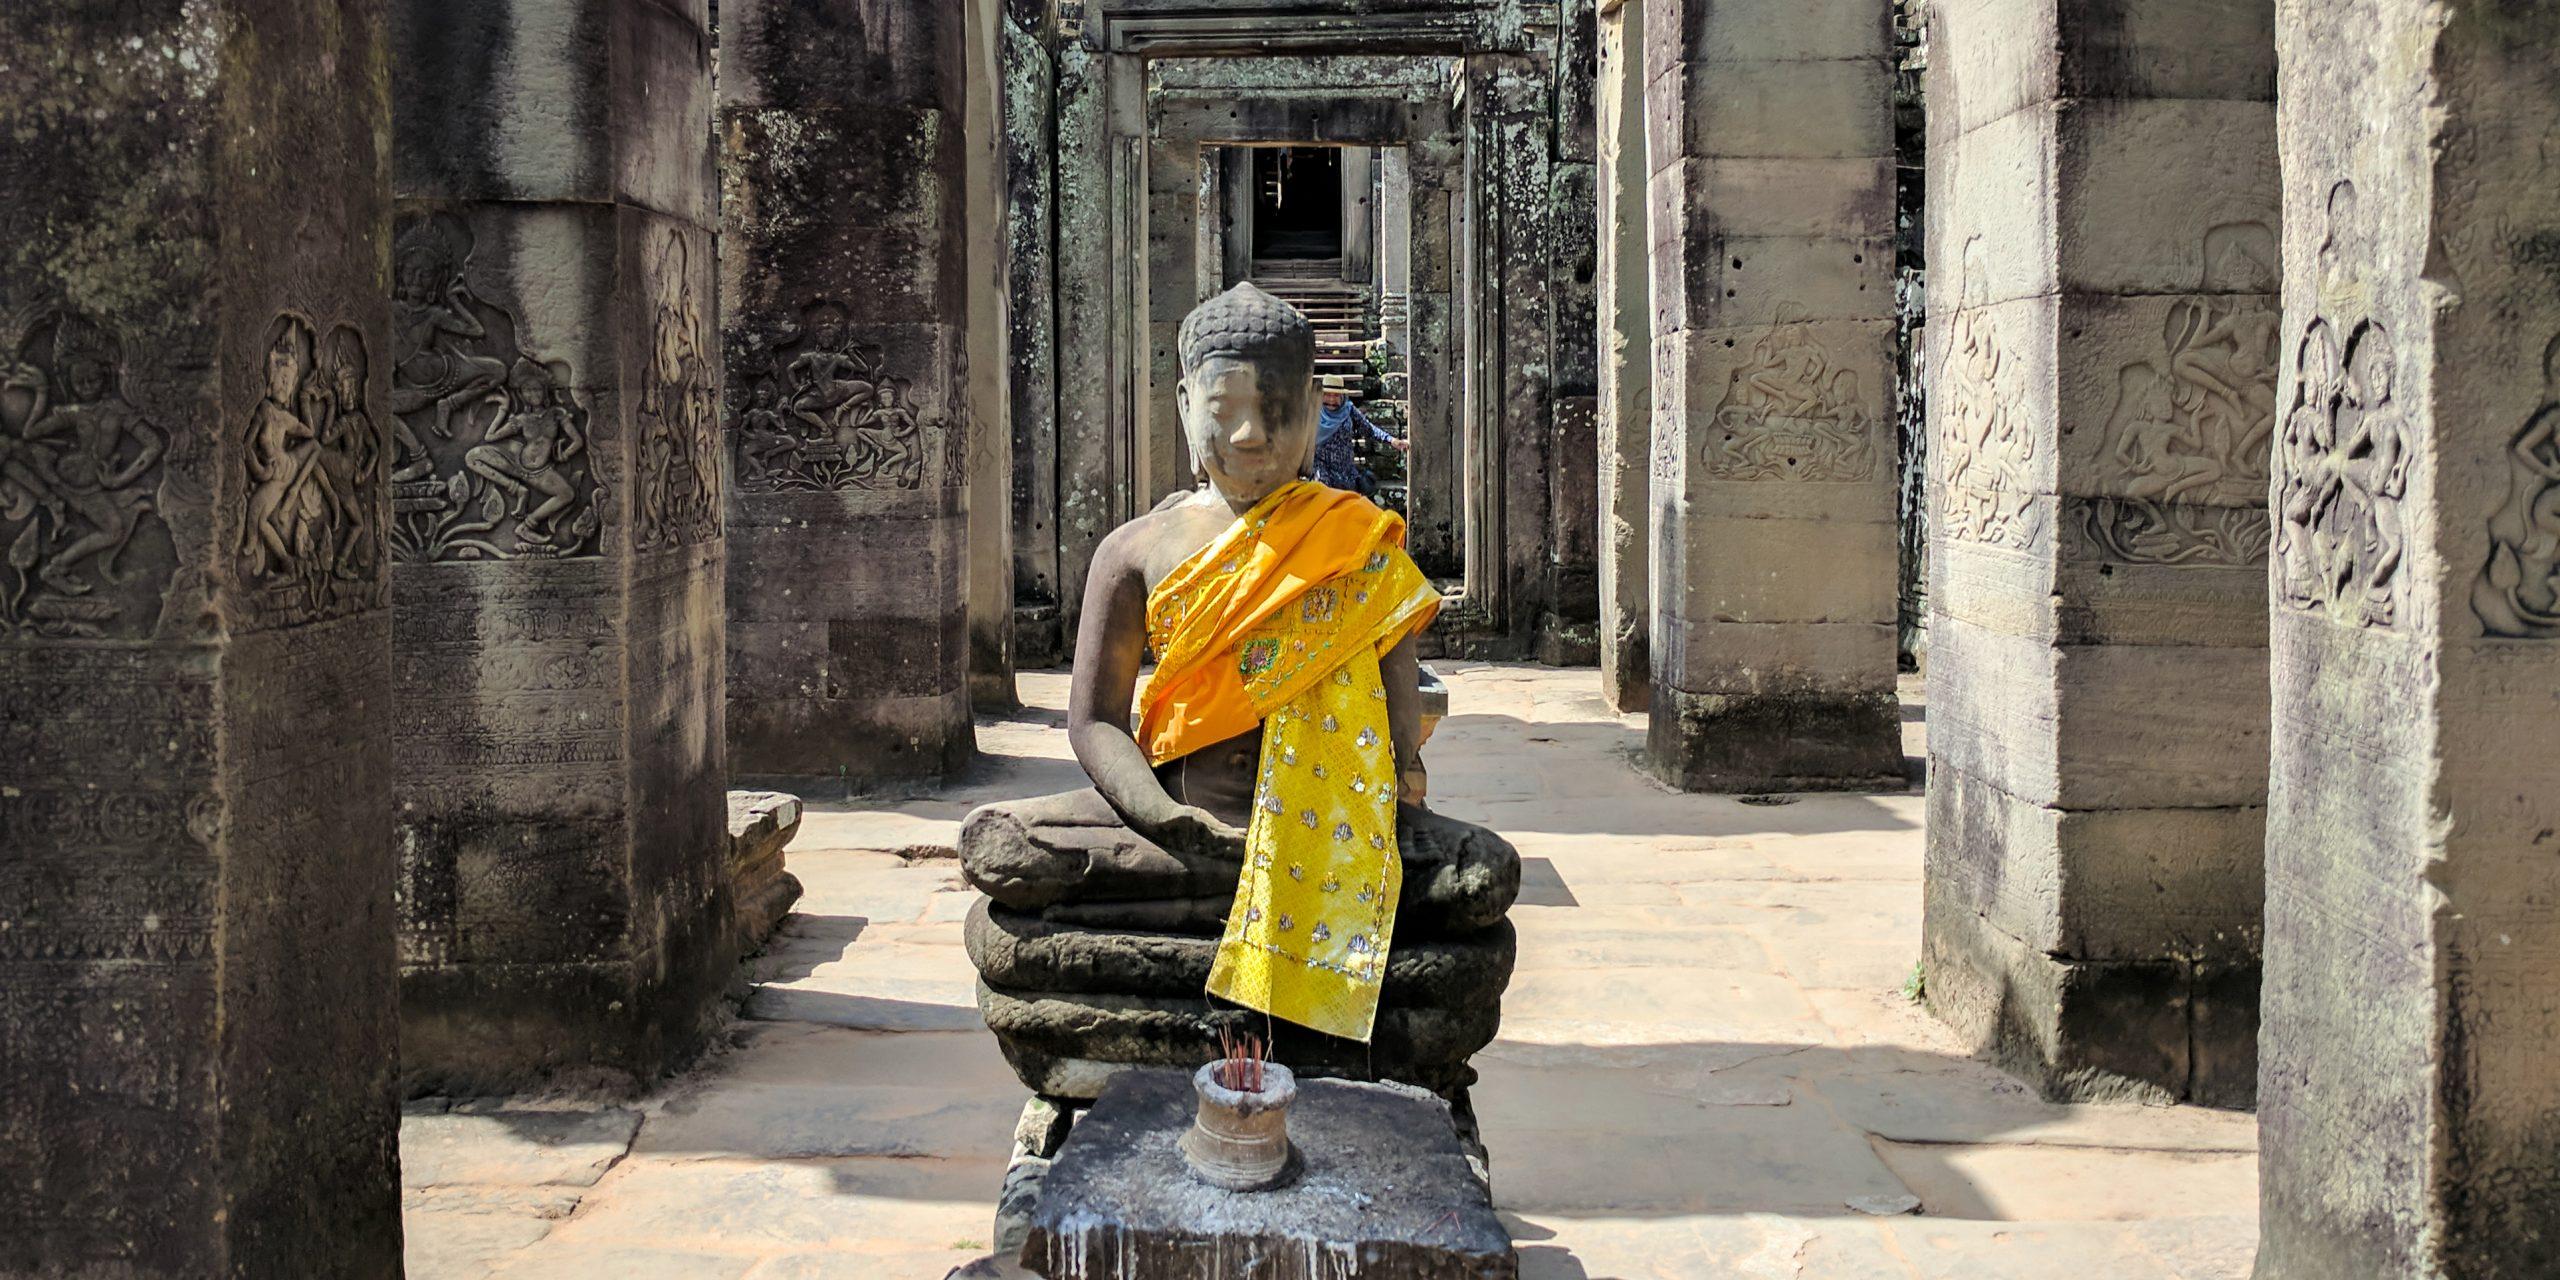 Buddha statue in Angkor Wat, Cambodia